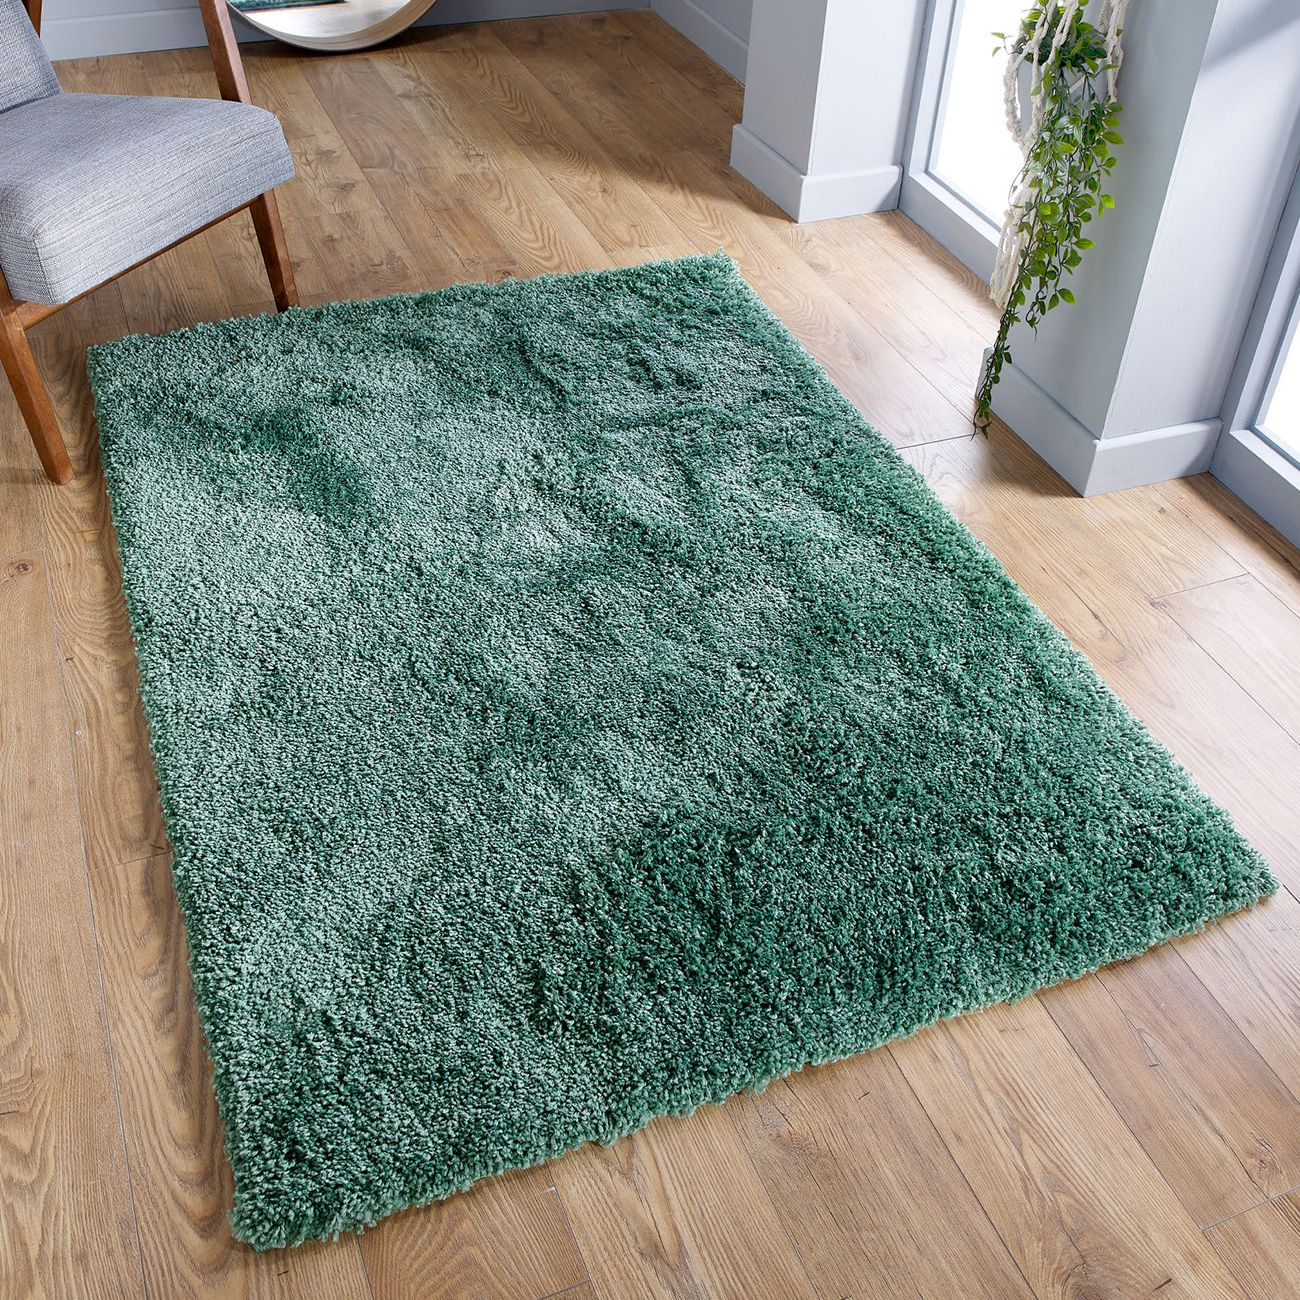 Serene Sage Green Plain Shaggy Rug By Oriental Weavers